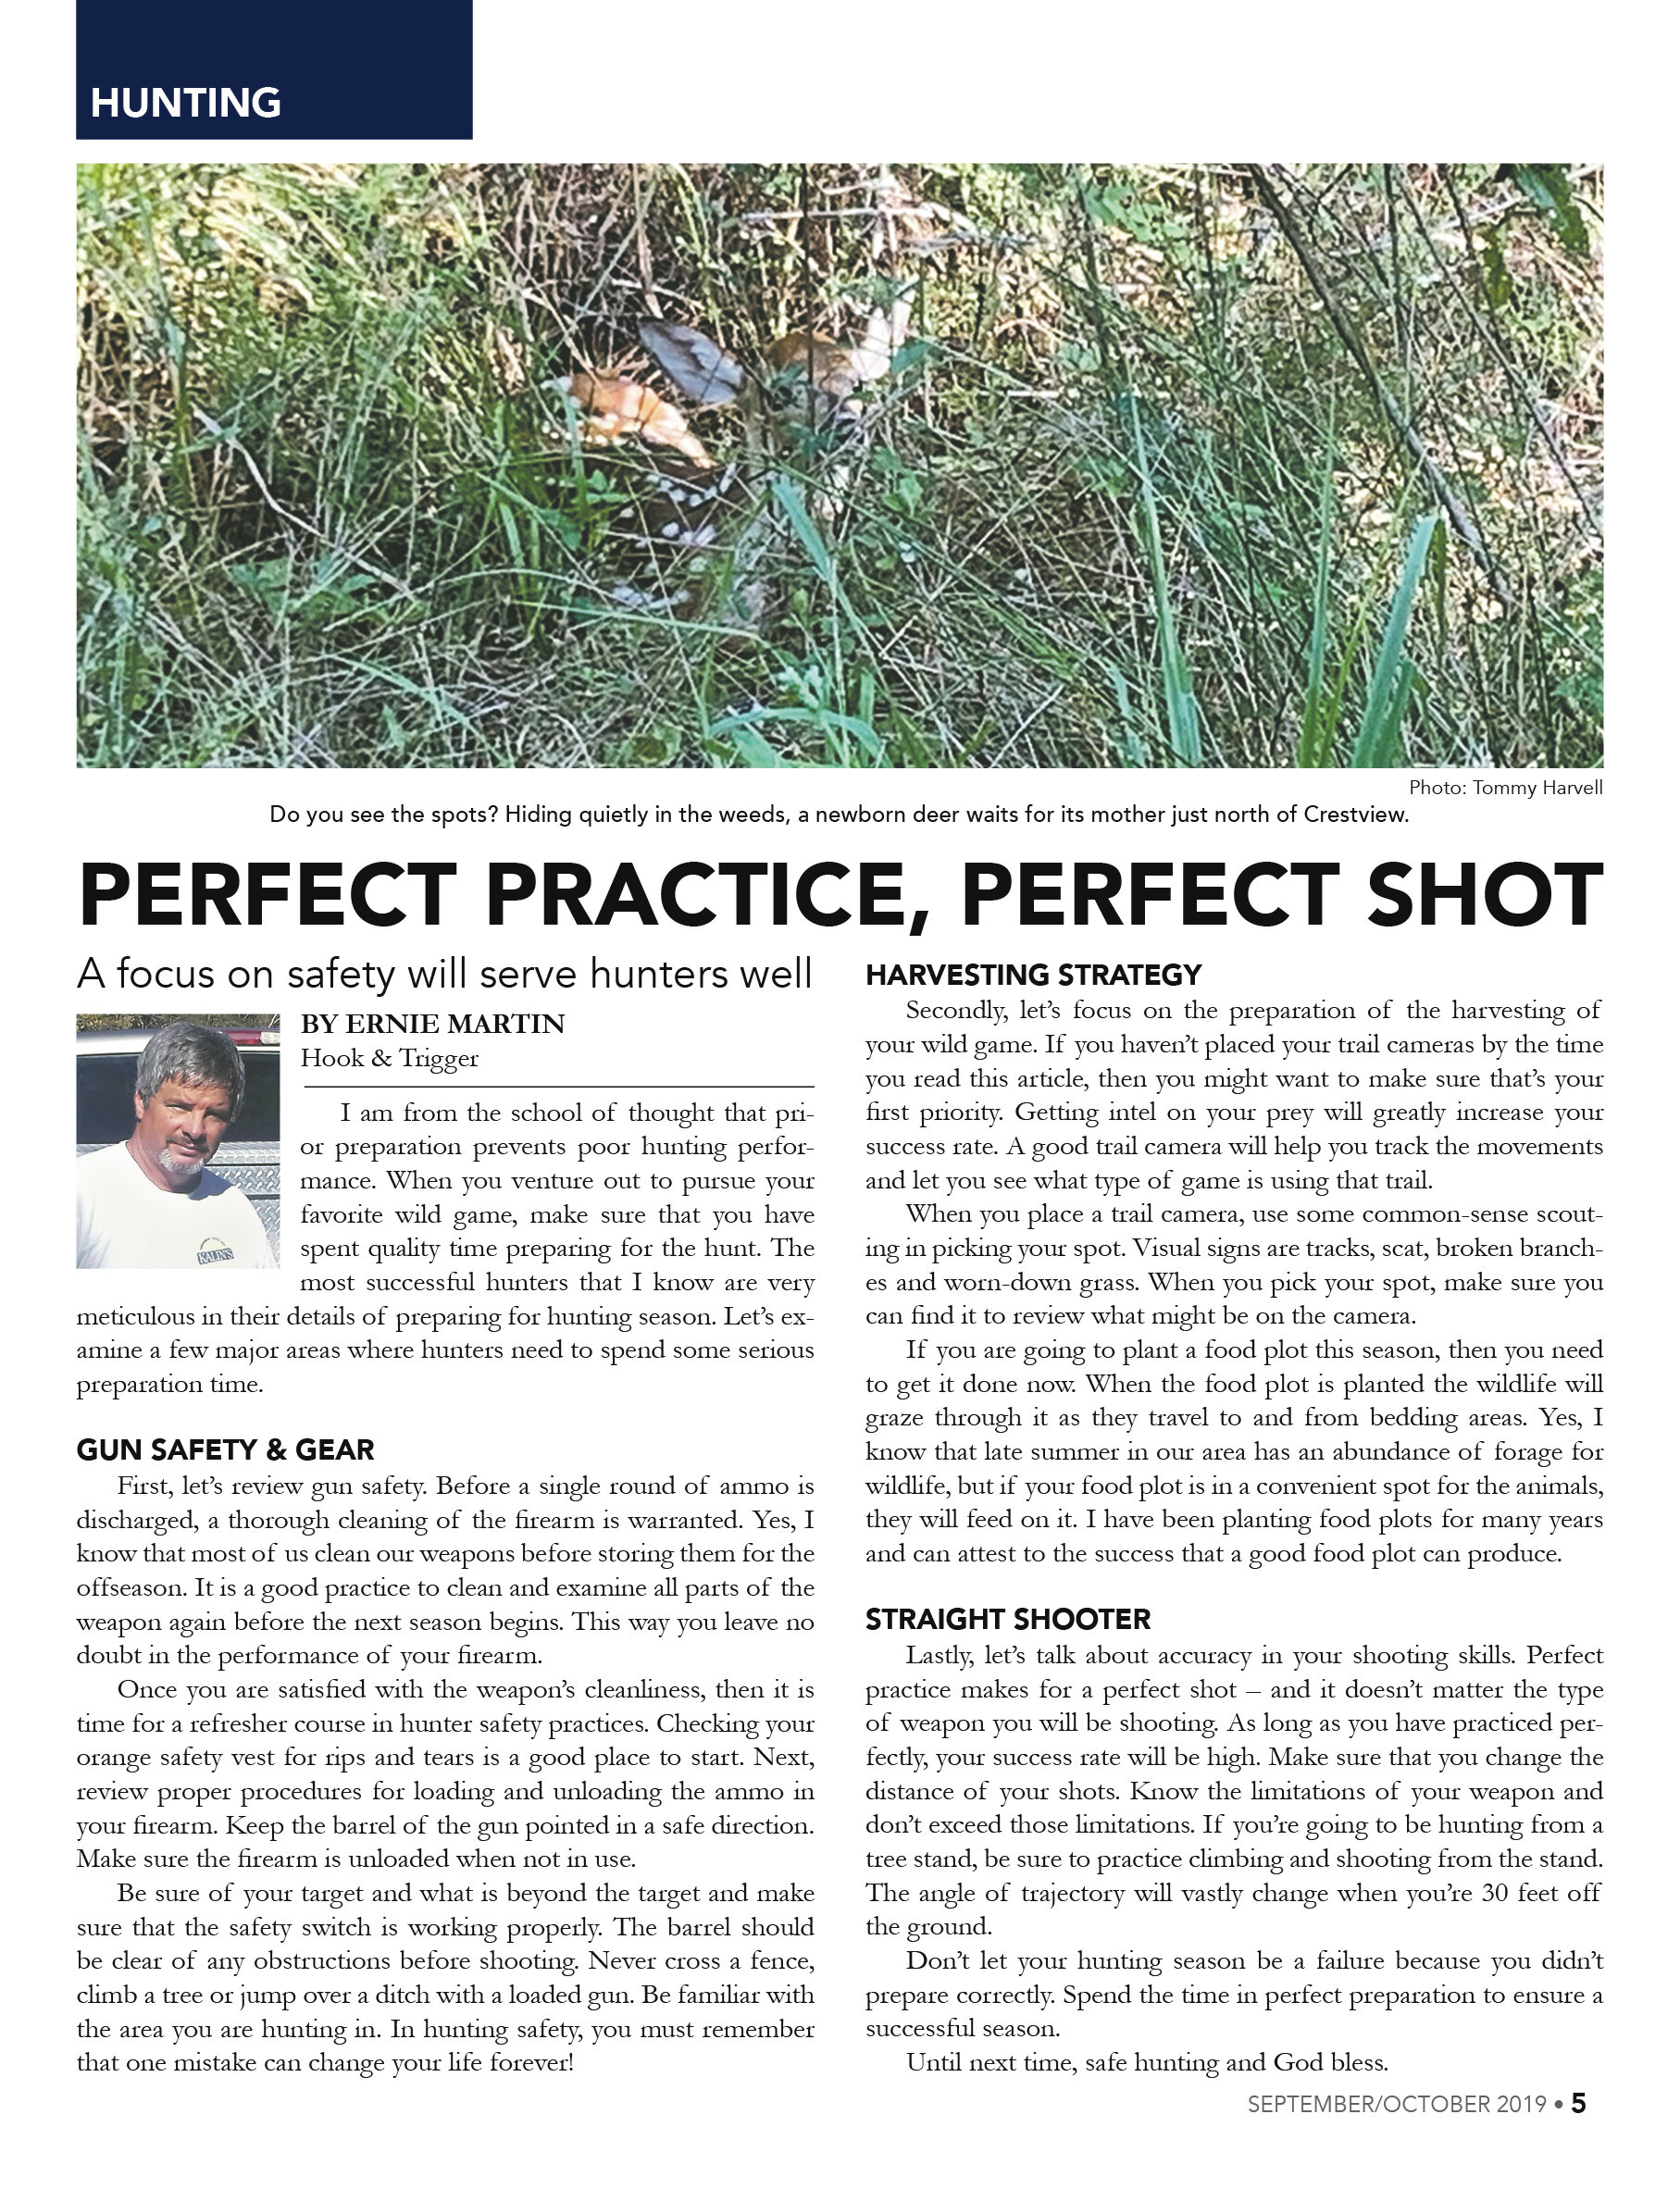 magazine-9-195.jpg